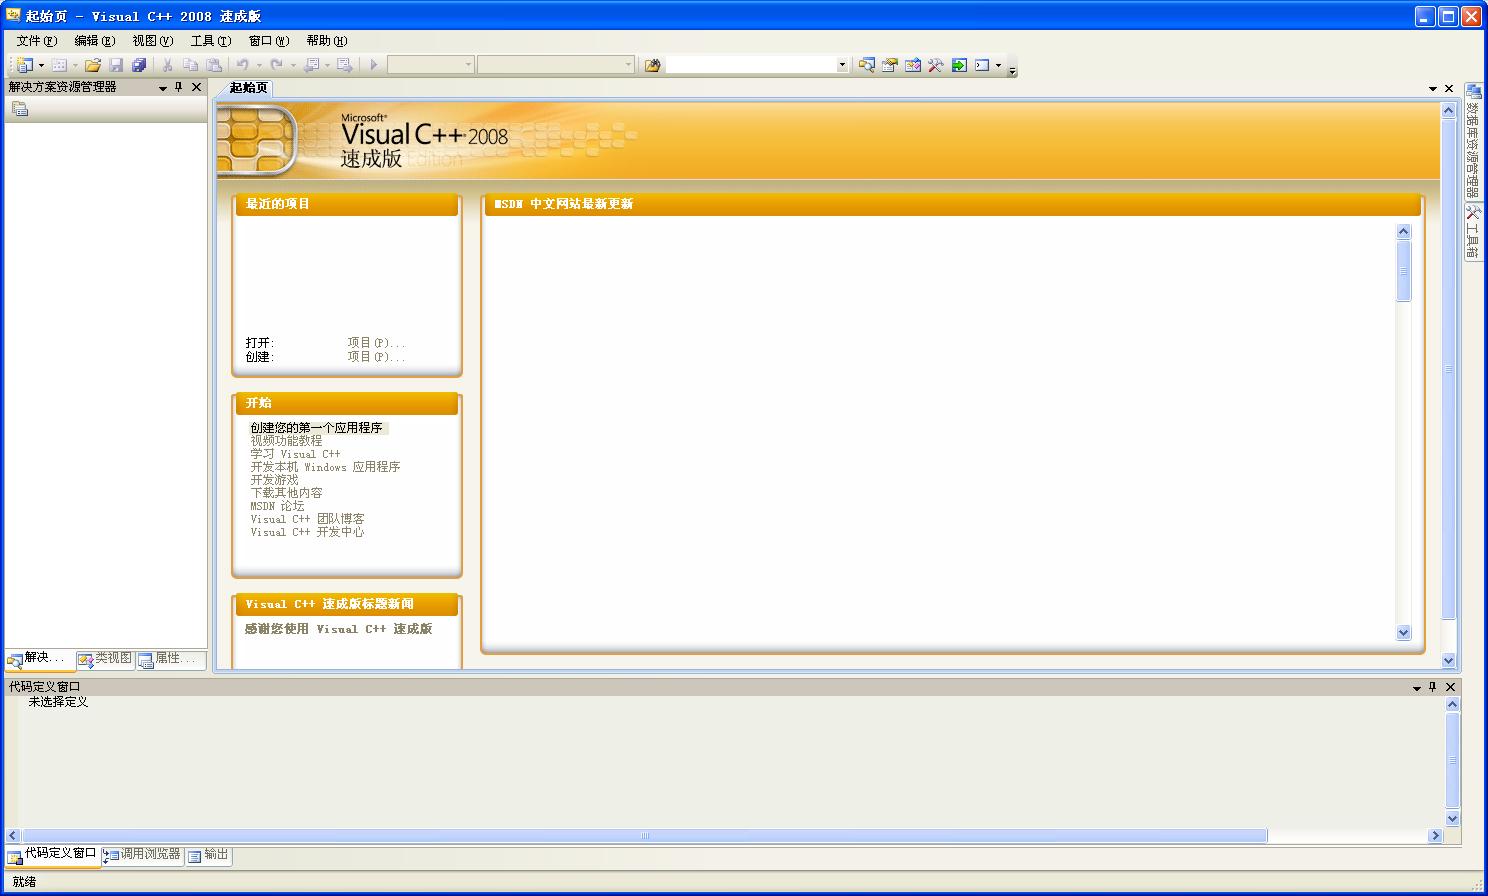 <span><b class=sec>Microsoft Visual</b></span>